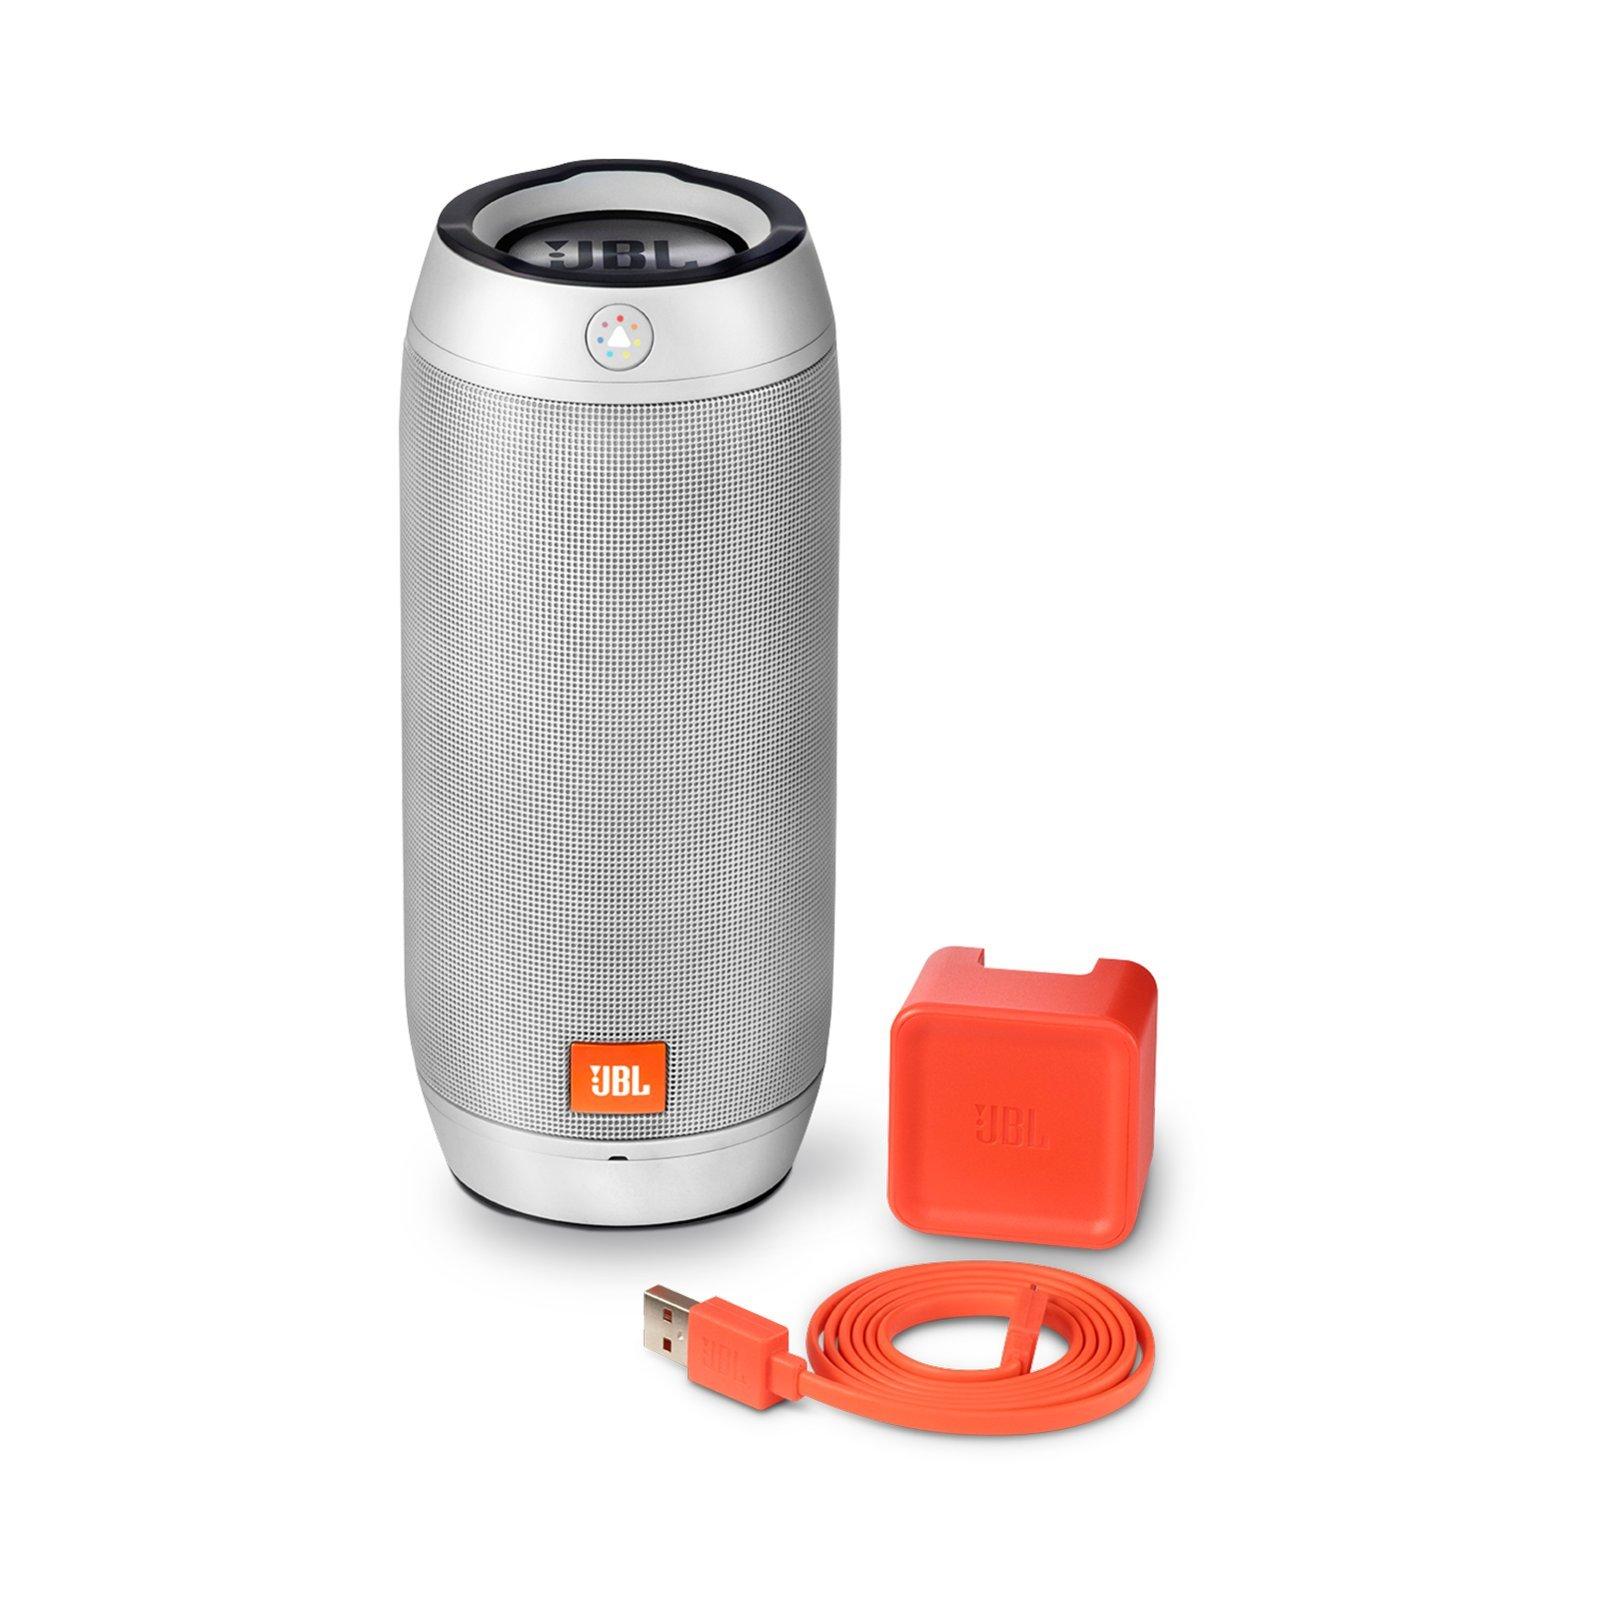 JBL Pulse 2 Portable Splashproof Bluetooth Speaker (Silver) by JBL (Image #4)